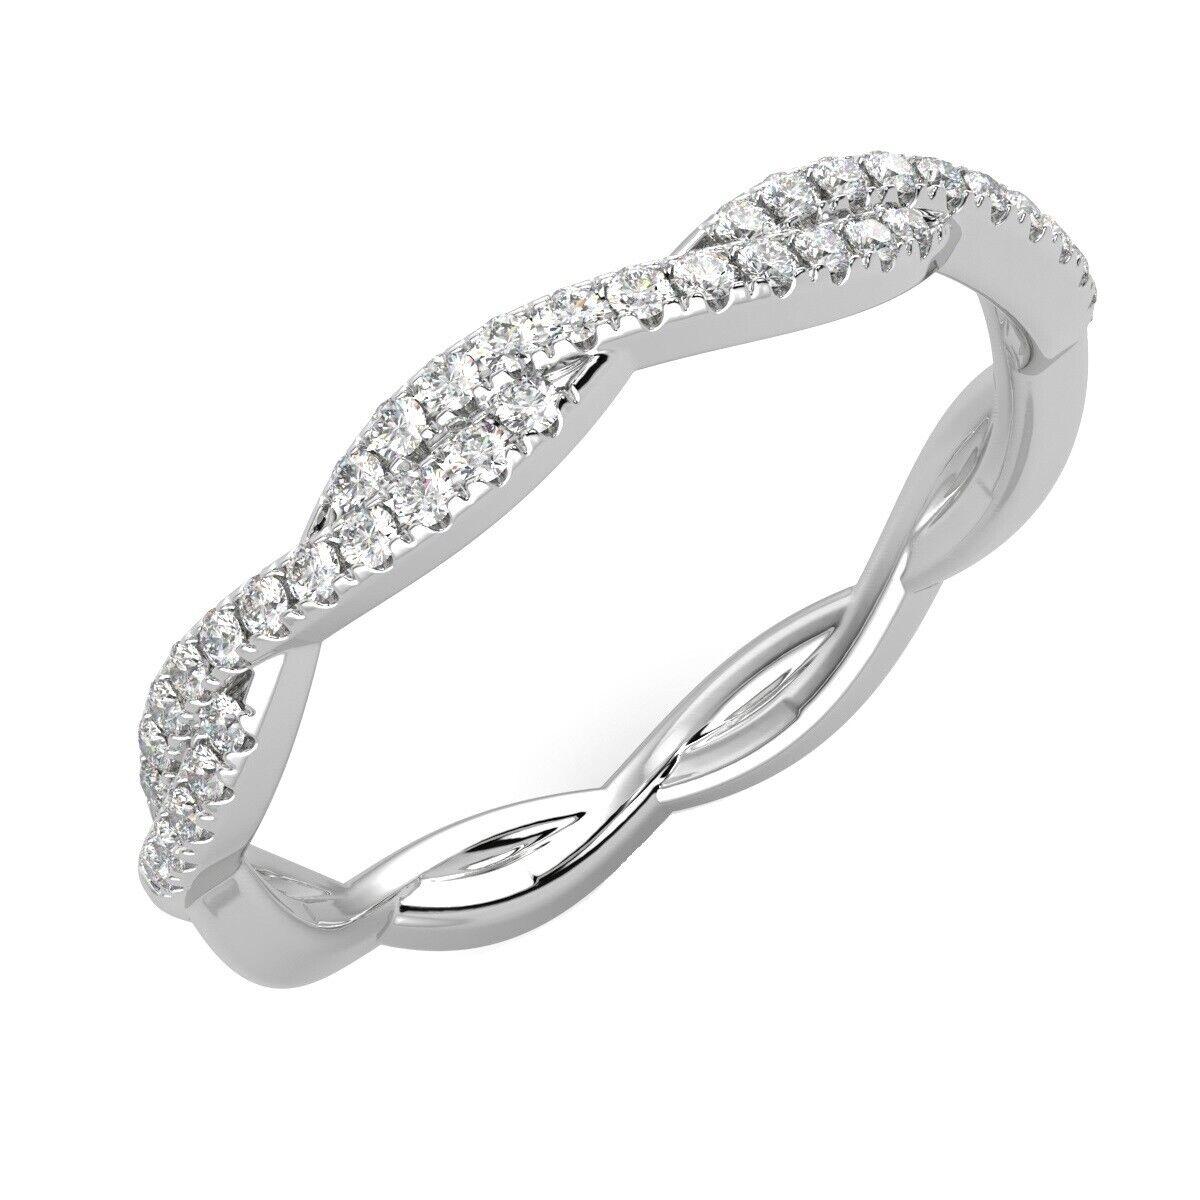 0.25 Carat Round Diamond Twisted Half Eternity Ring, UK Hallmarked White gold